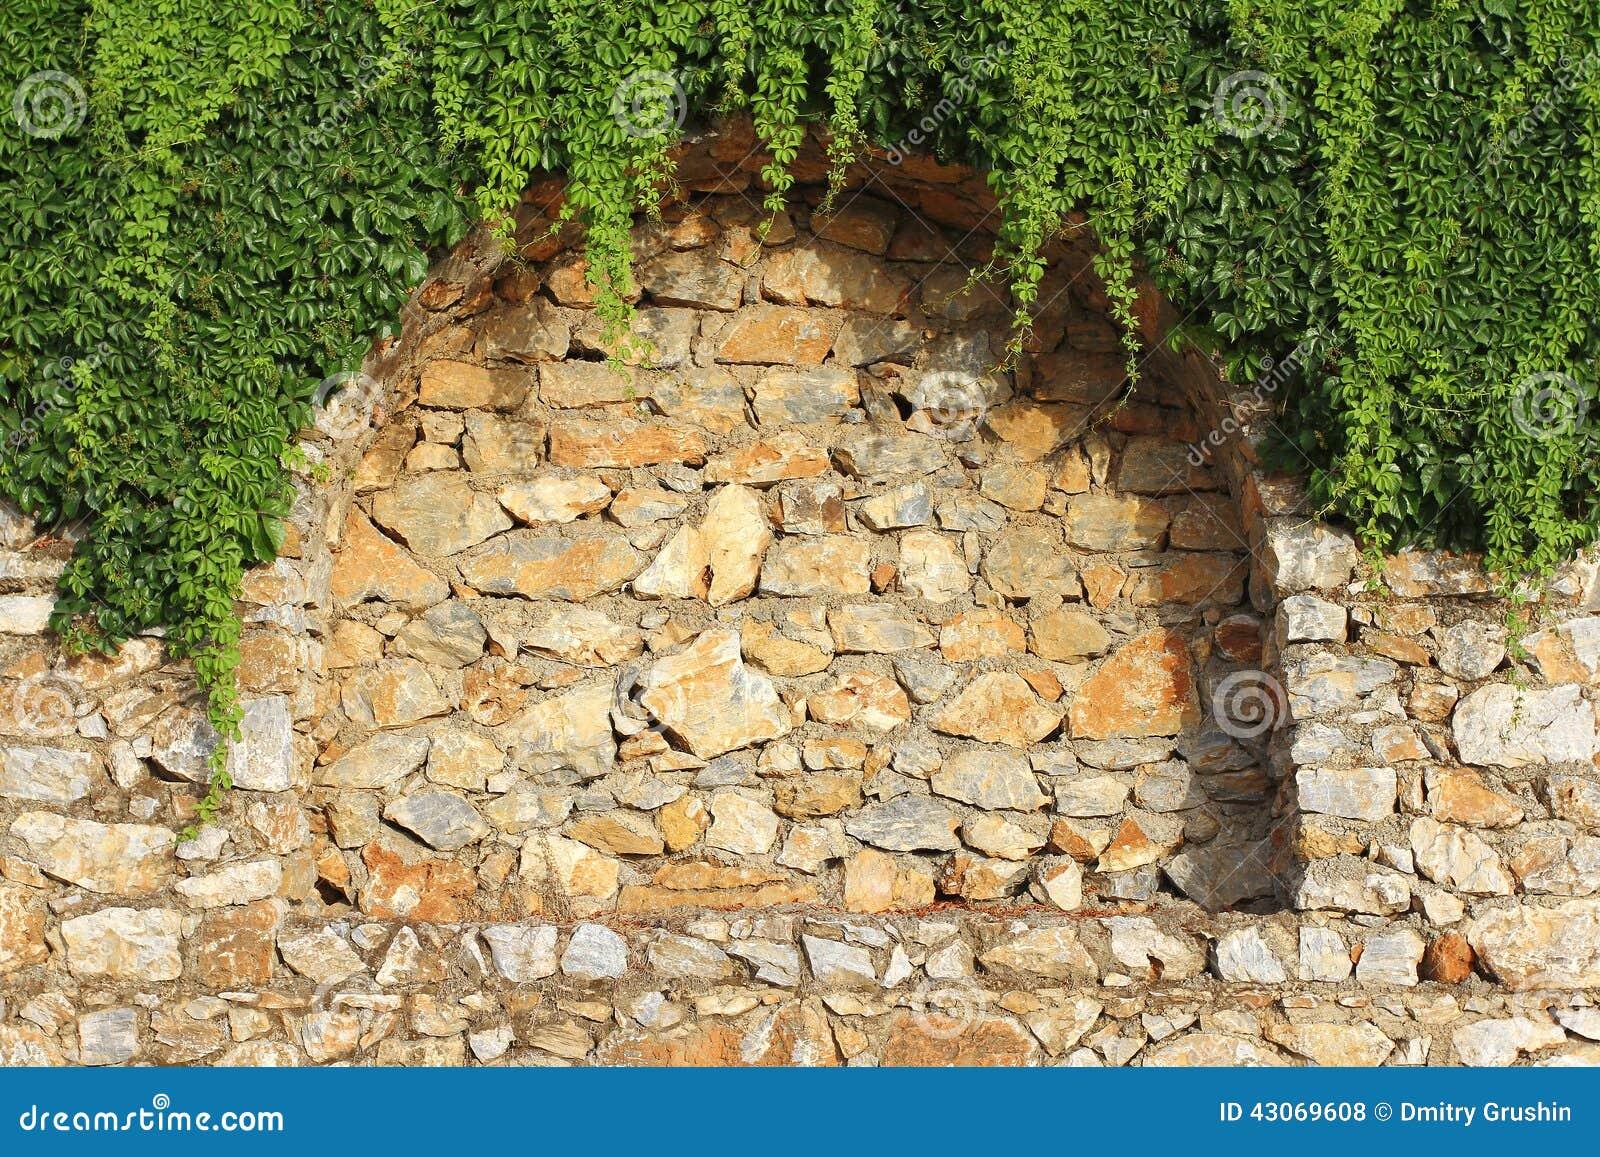 Brick Wall And Climbing Plant Stock Photo 43069608 - Megapixl